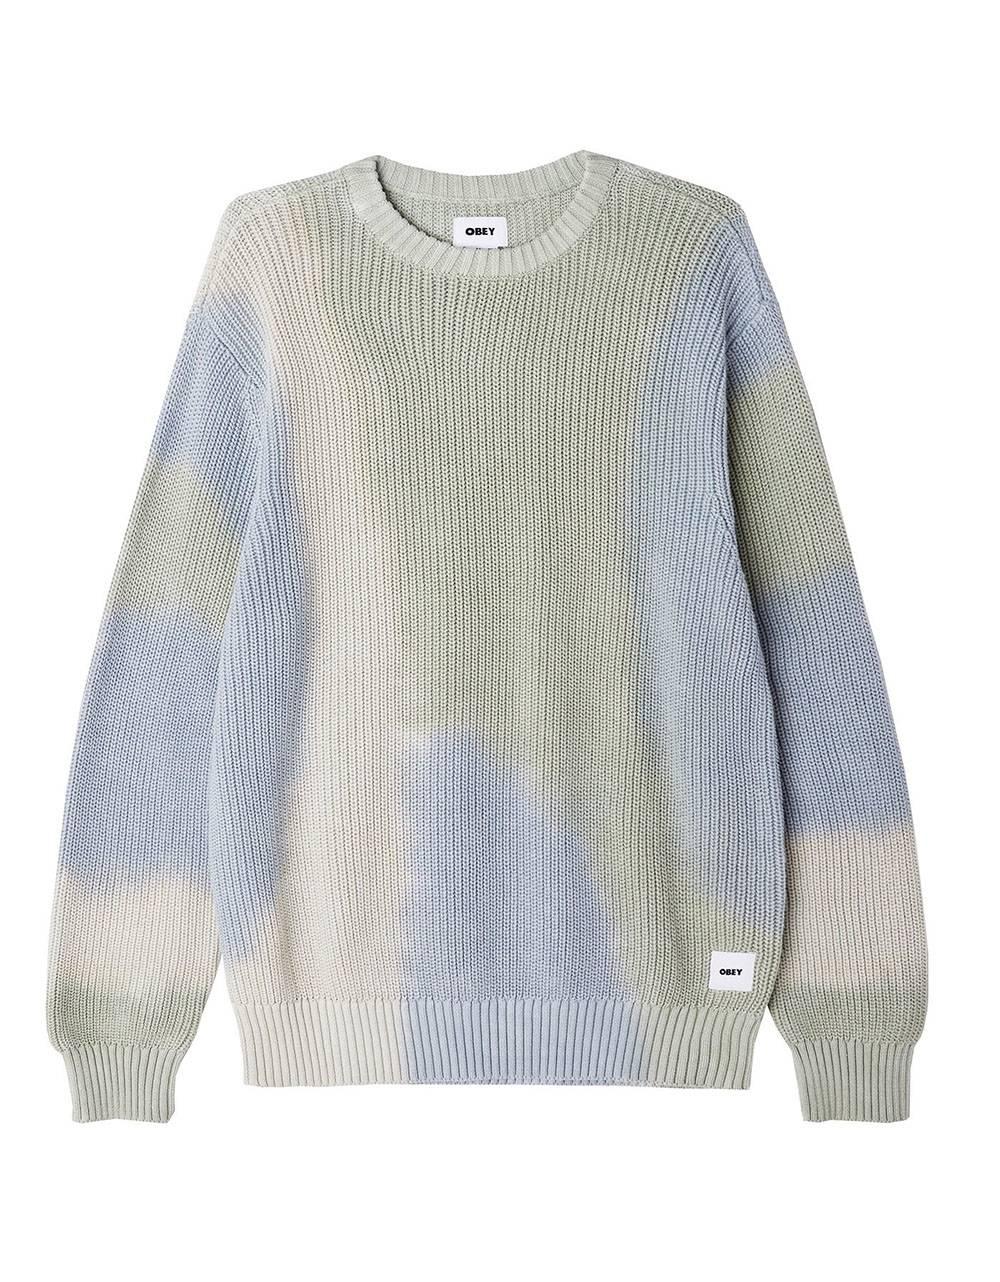 Obey Bold label organic kint sweater - good grey multi obey Knitwear 97,54€